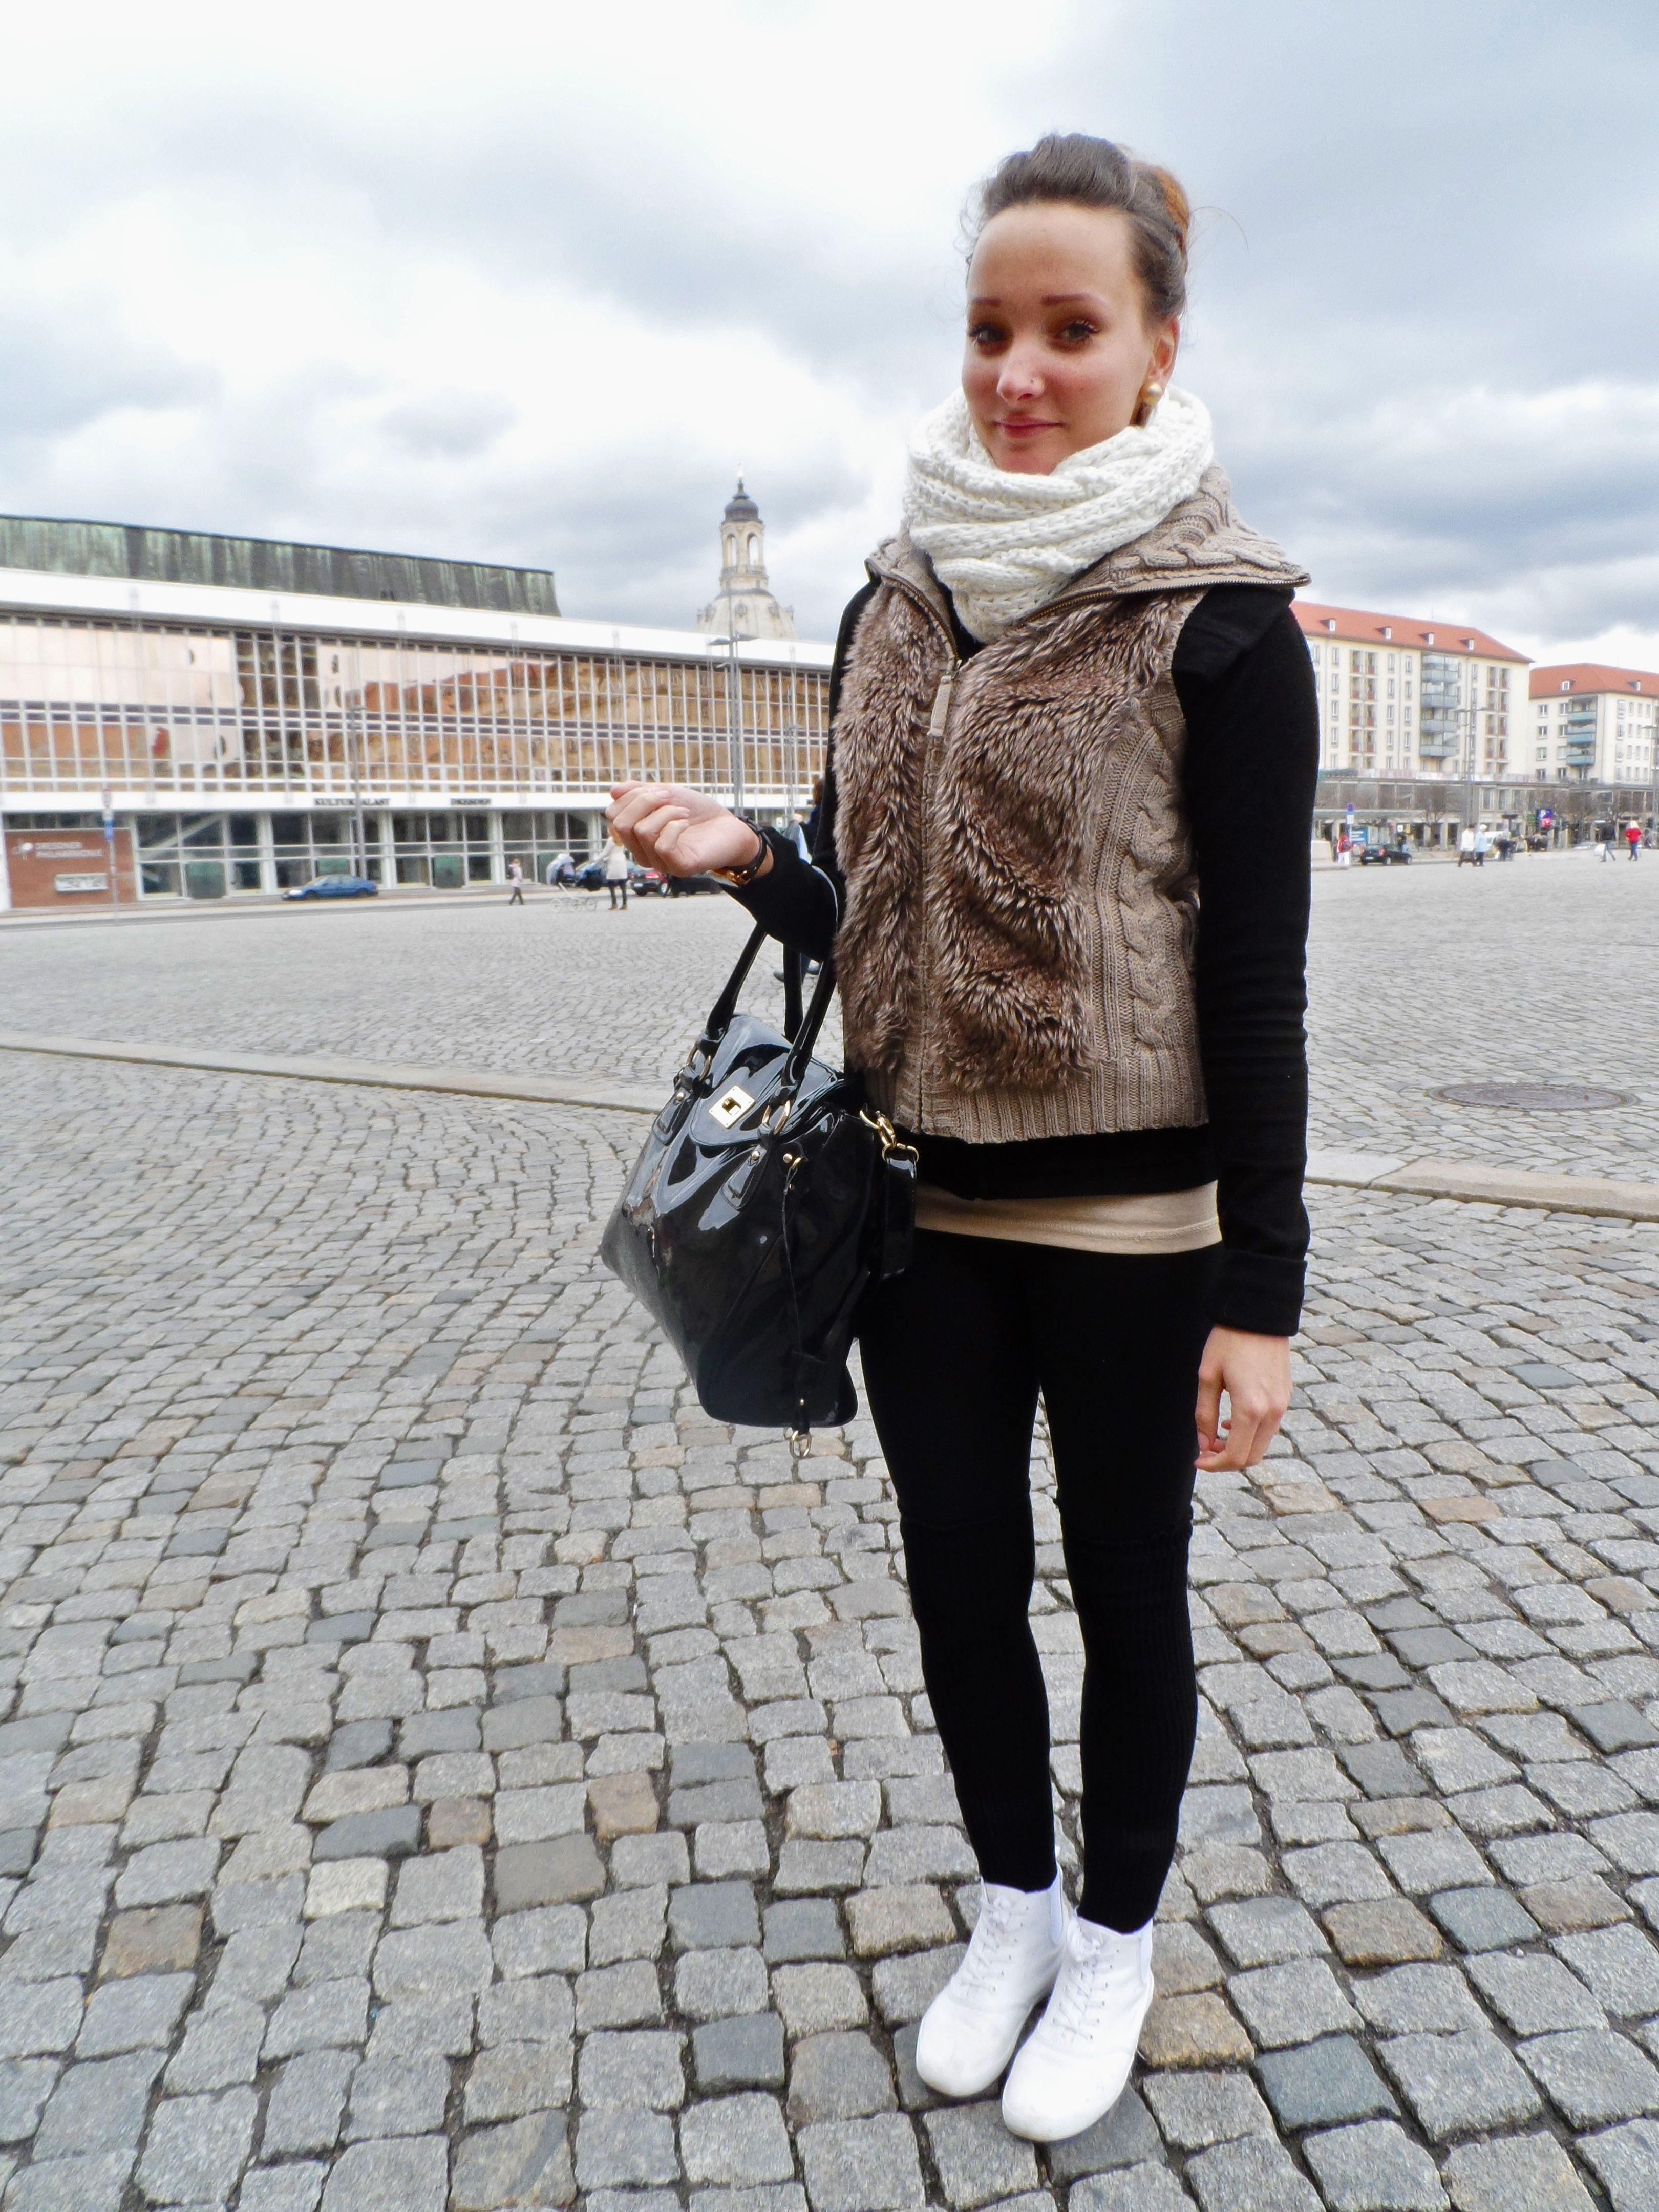 European Street Fashion The Image Kid Has It